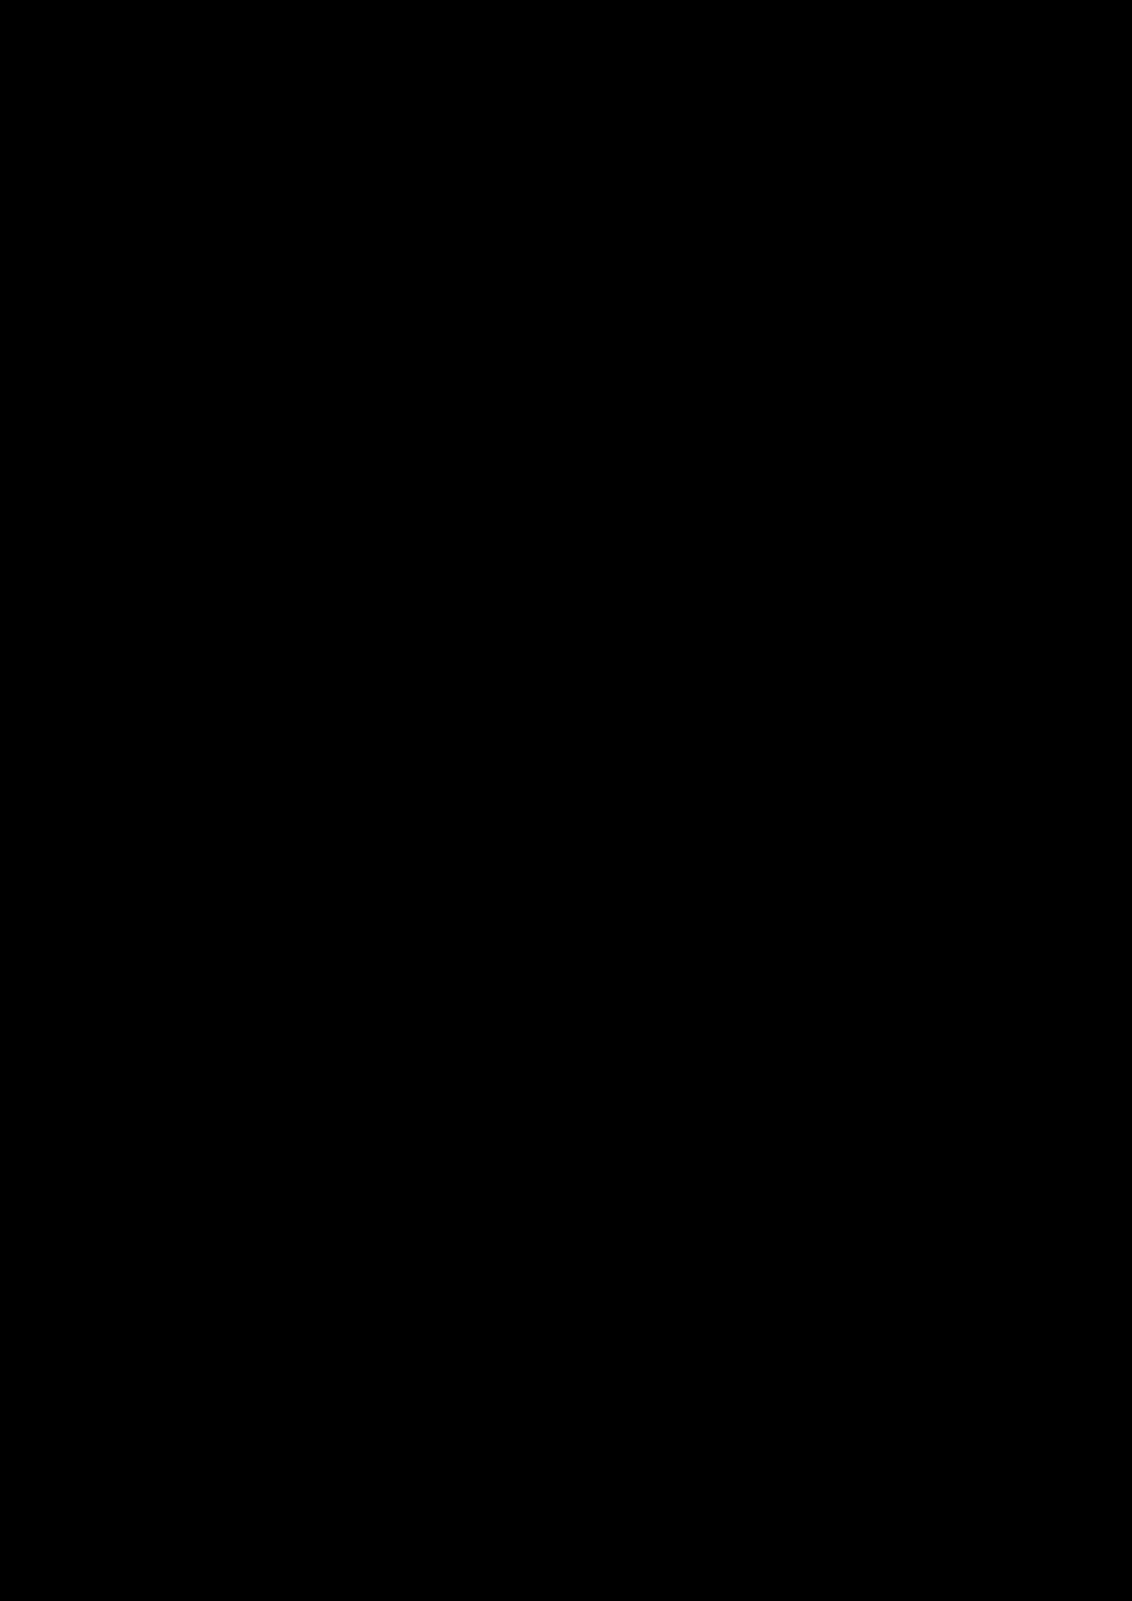 Ten lyubvi slide, Image 42